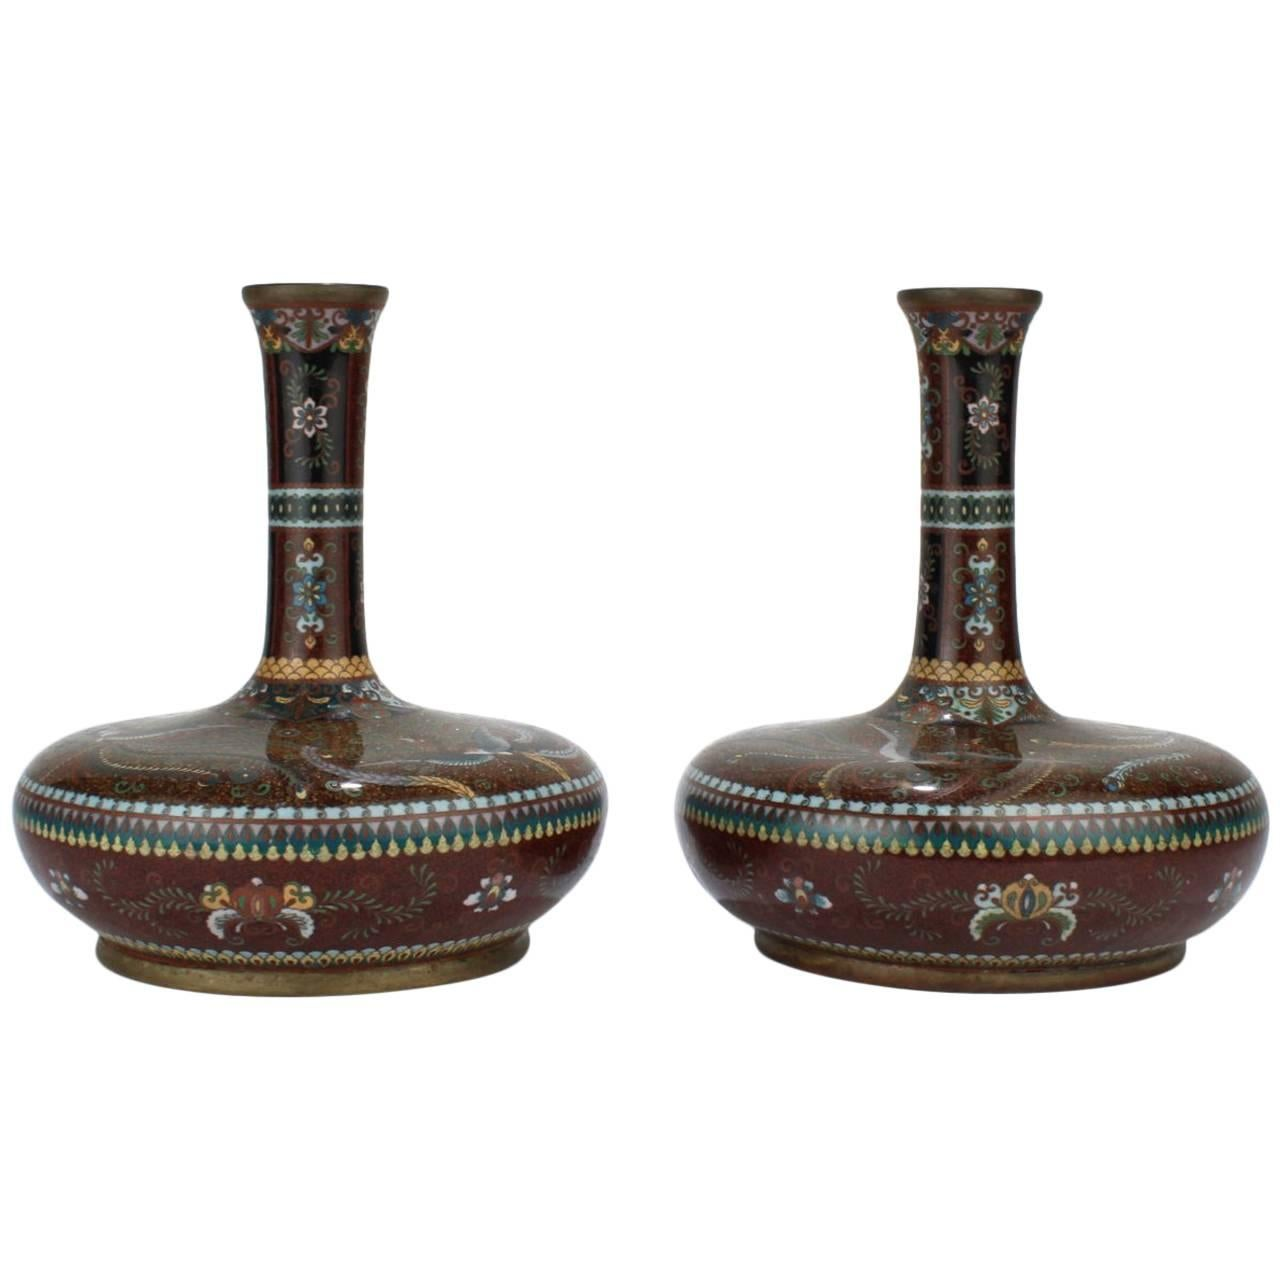 Pair of Large Antique Japanese Meiji Period Cloisonne Vases